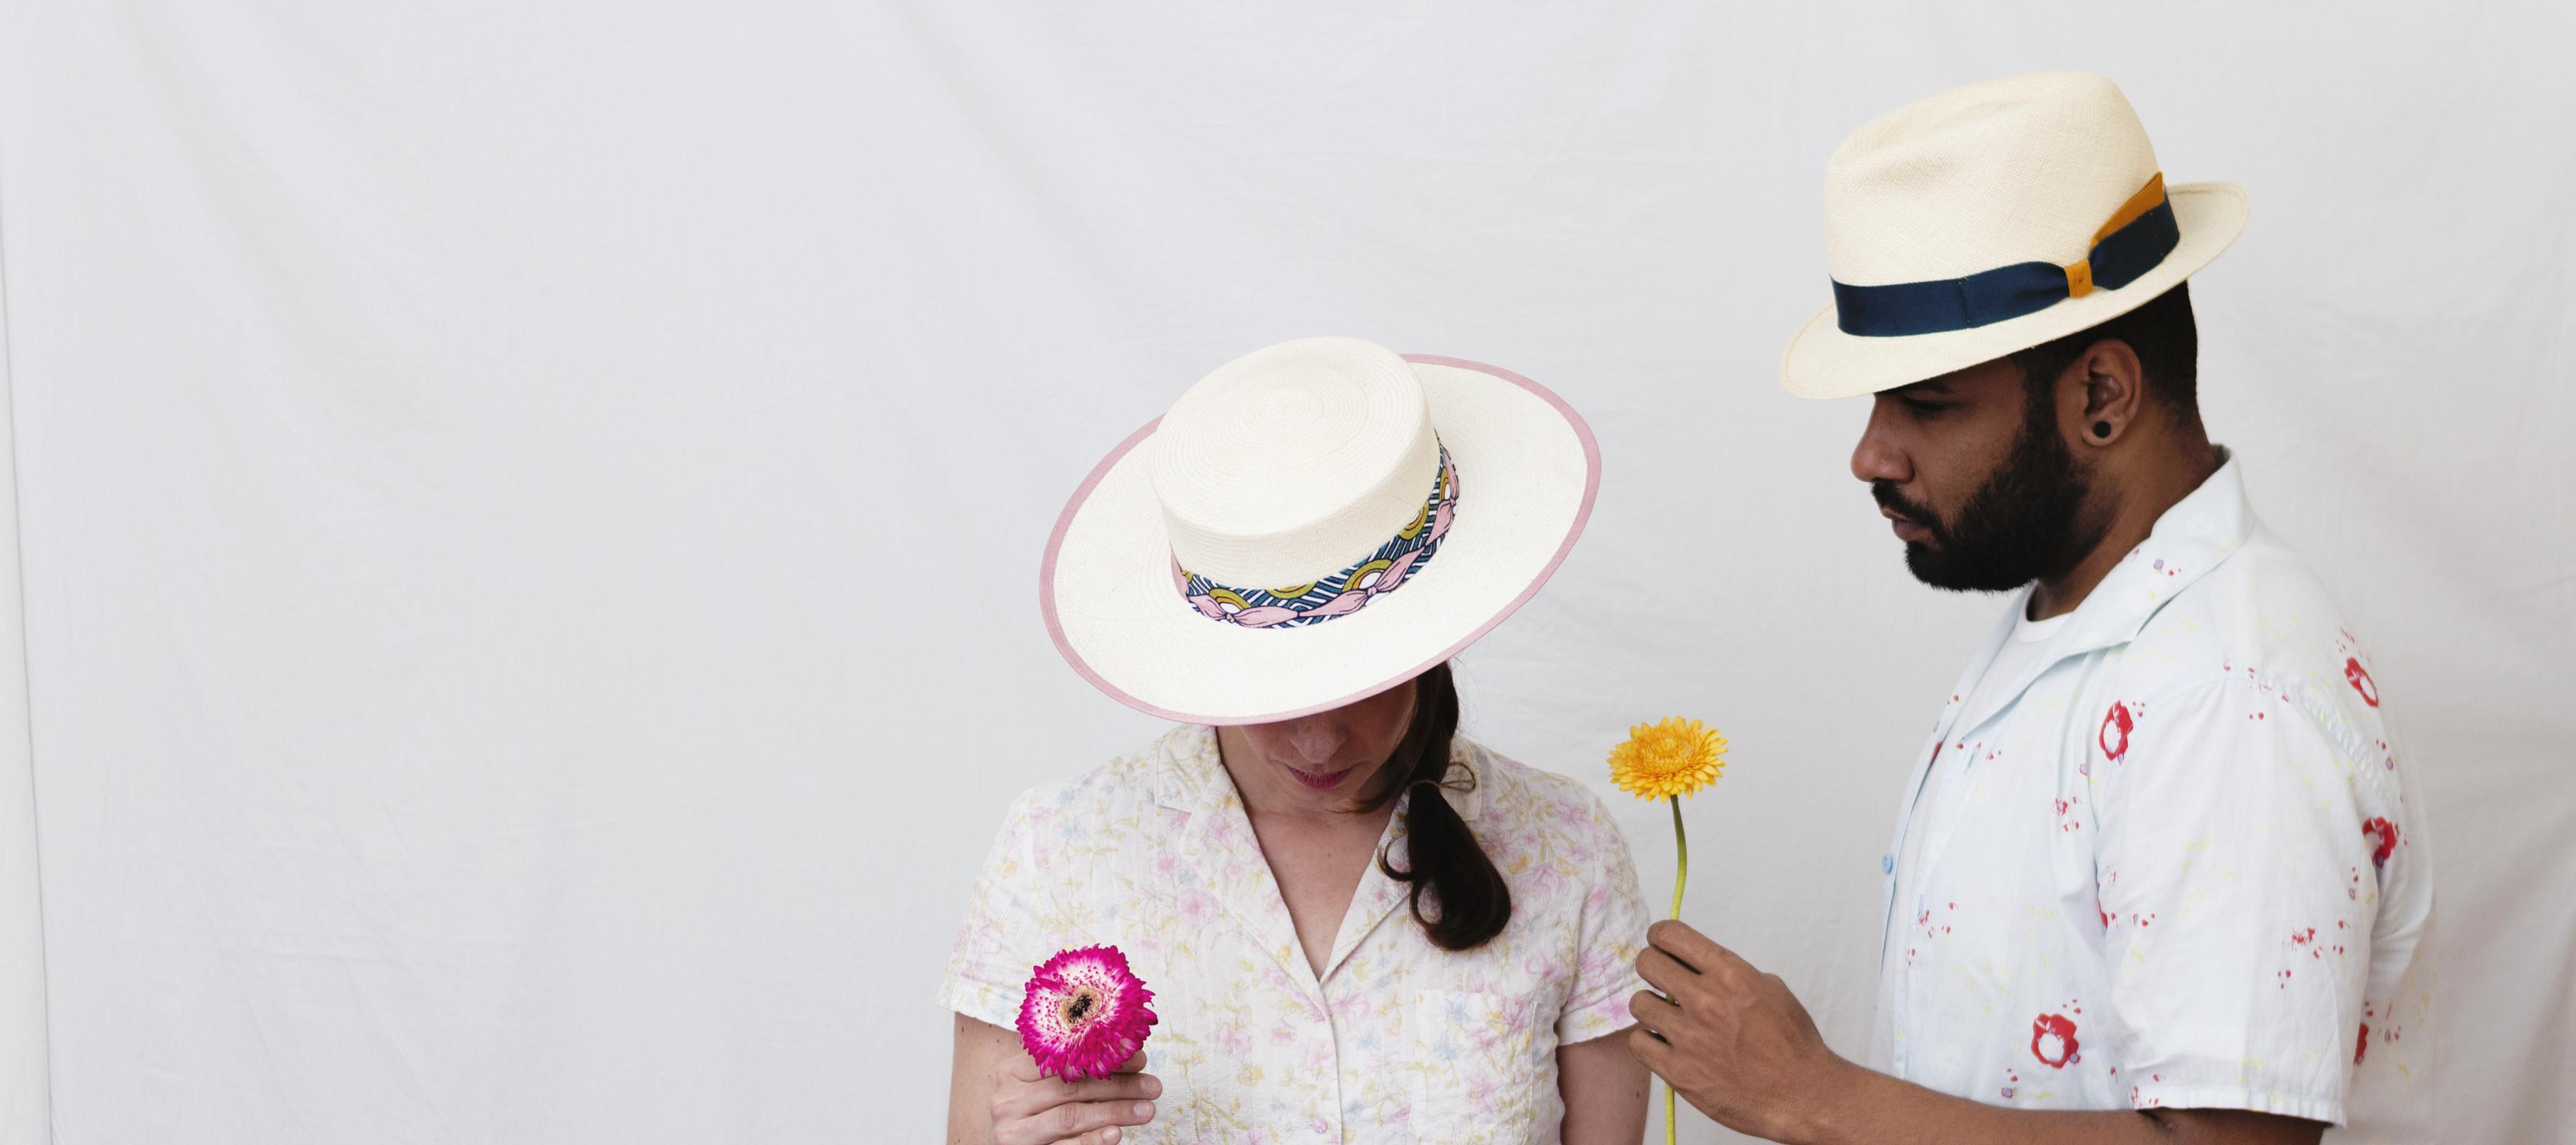 Hats 1